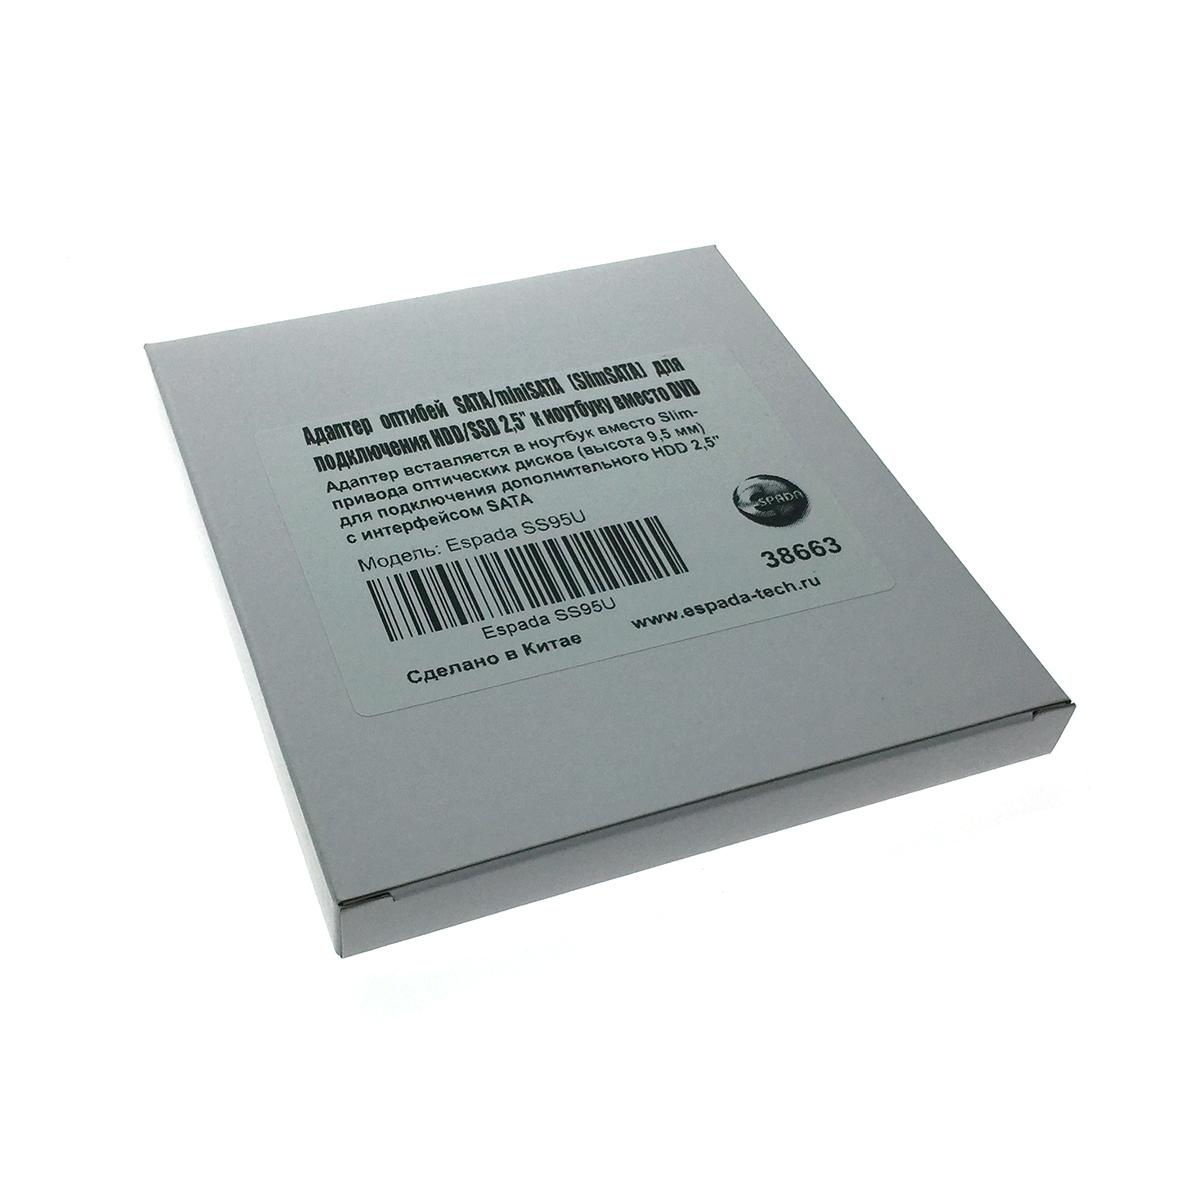 "Адаптер оптибей Espada SS95U SATA/miniSATA/SlimSATA 9,5мм для подключения HDD/SSD 2,5"" к ноутбуку вместо DVD"